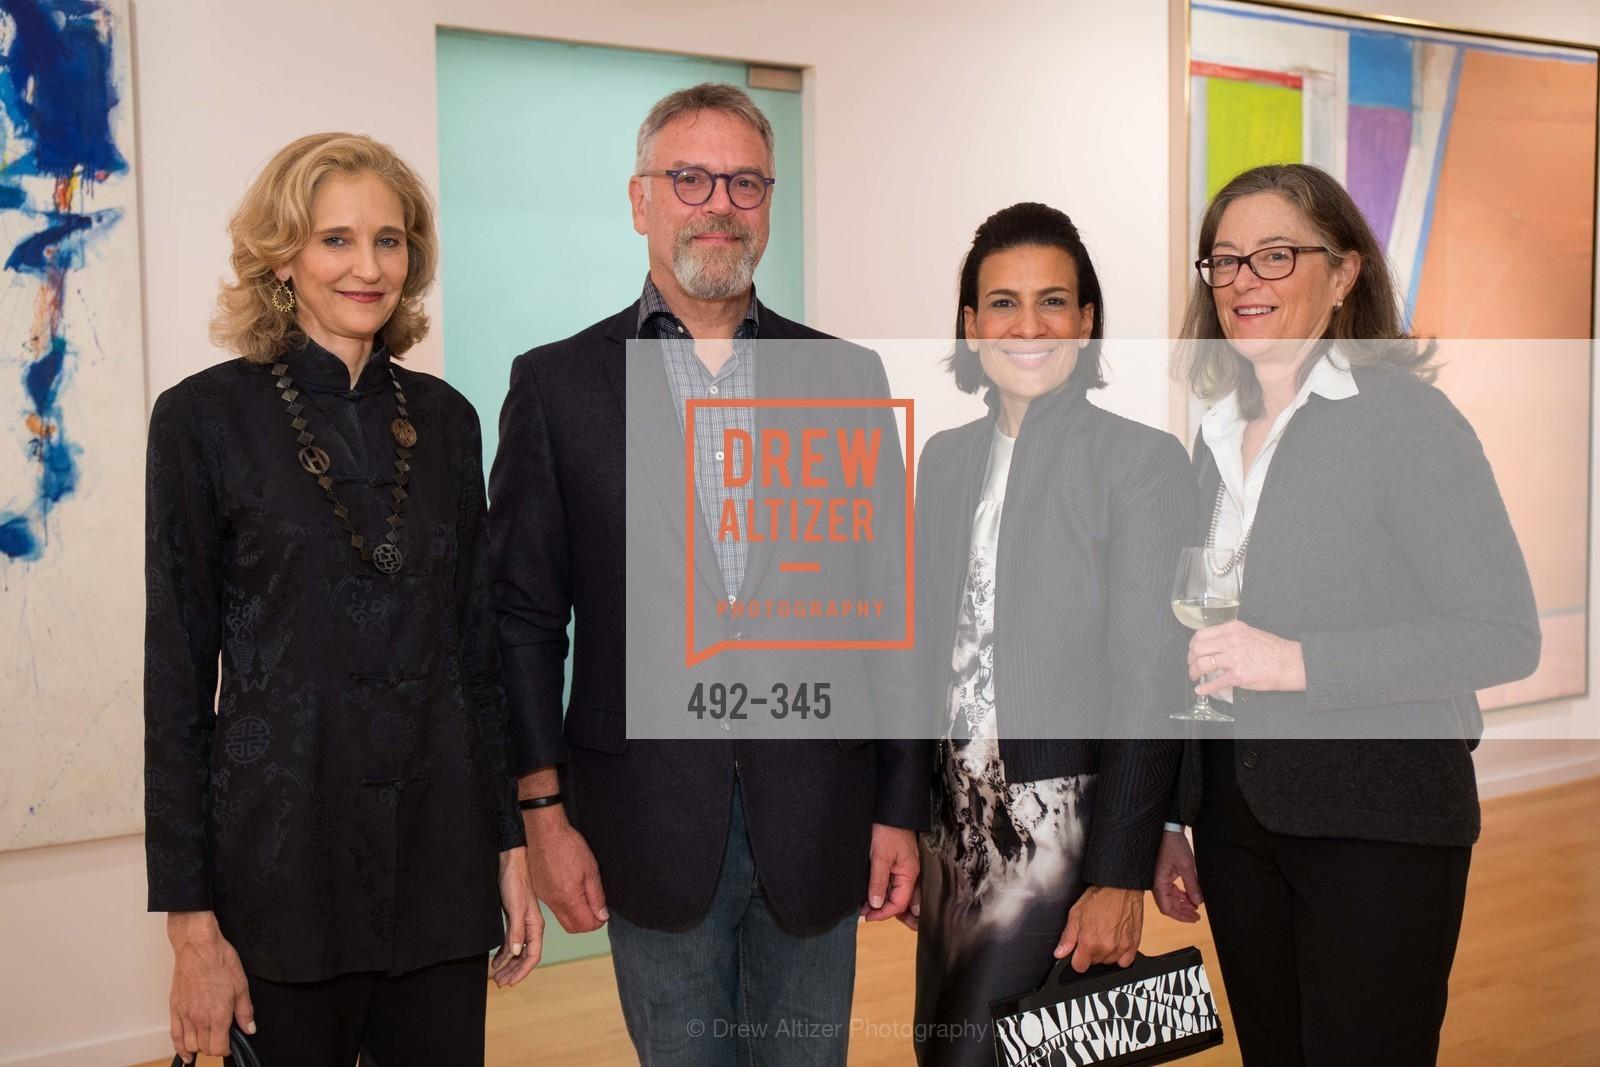 Jennifer Biederbeck, Nion McEvoy, Andrea Fiuczynski, Elena Gates, John Berggruen Gallery presents